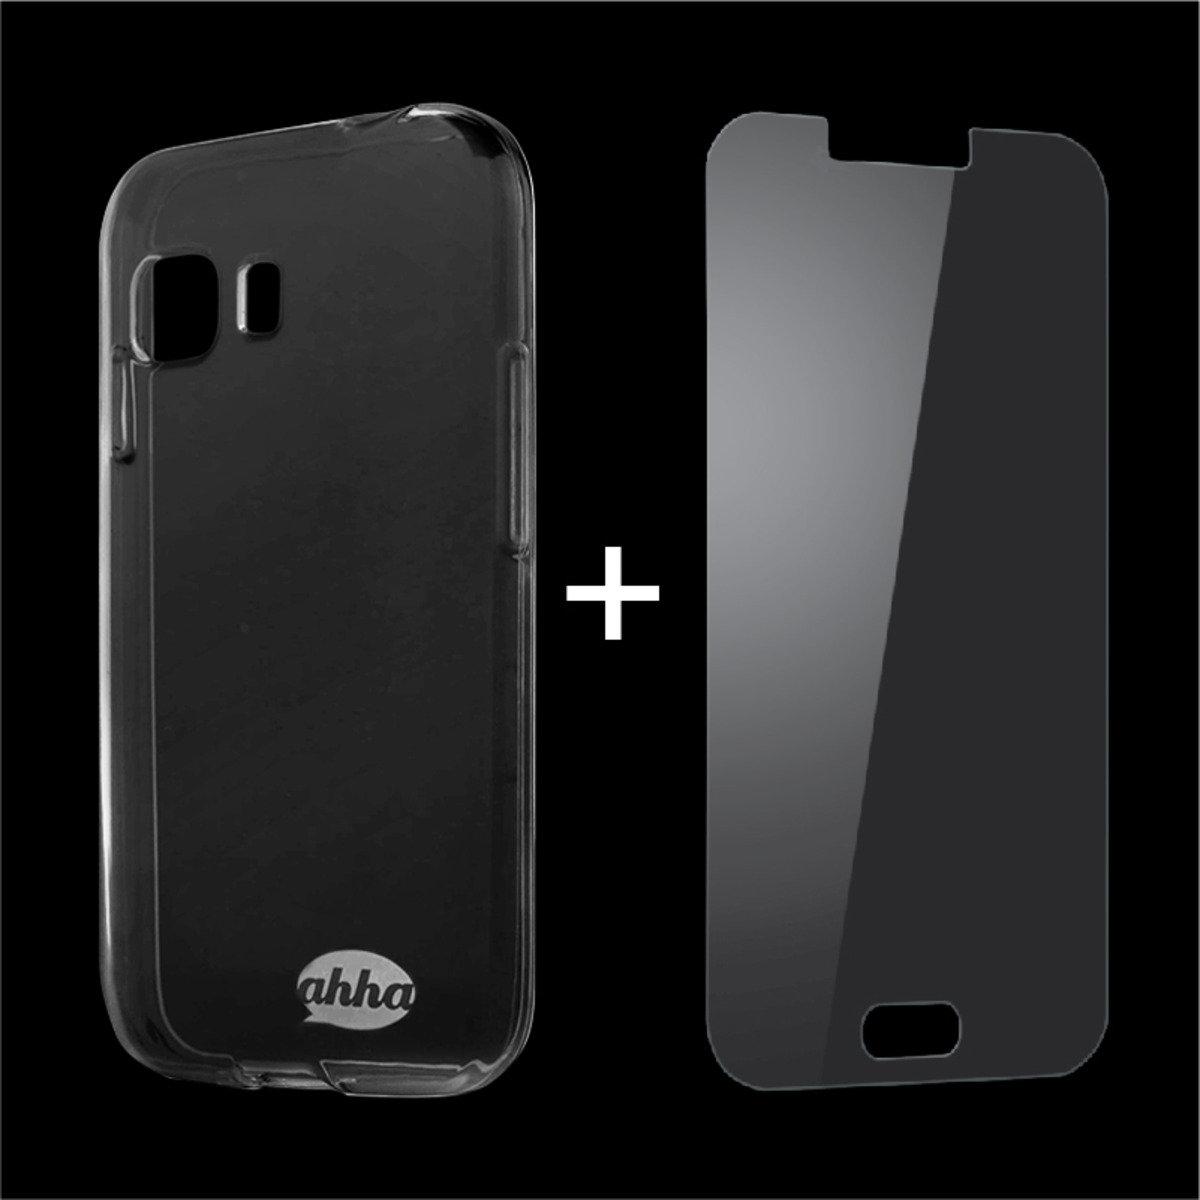 Samsung Galaxy Young 2 Duos 手機保護殼 及 鋼化玻璃膜 套裝 (透明)